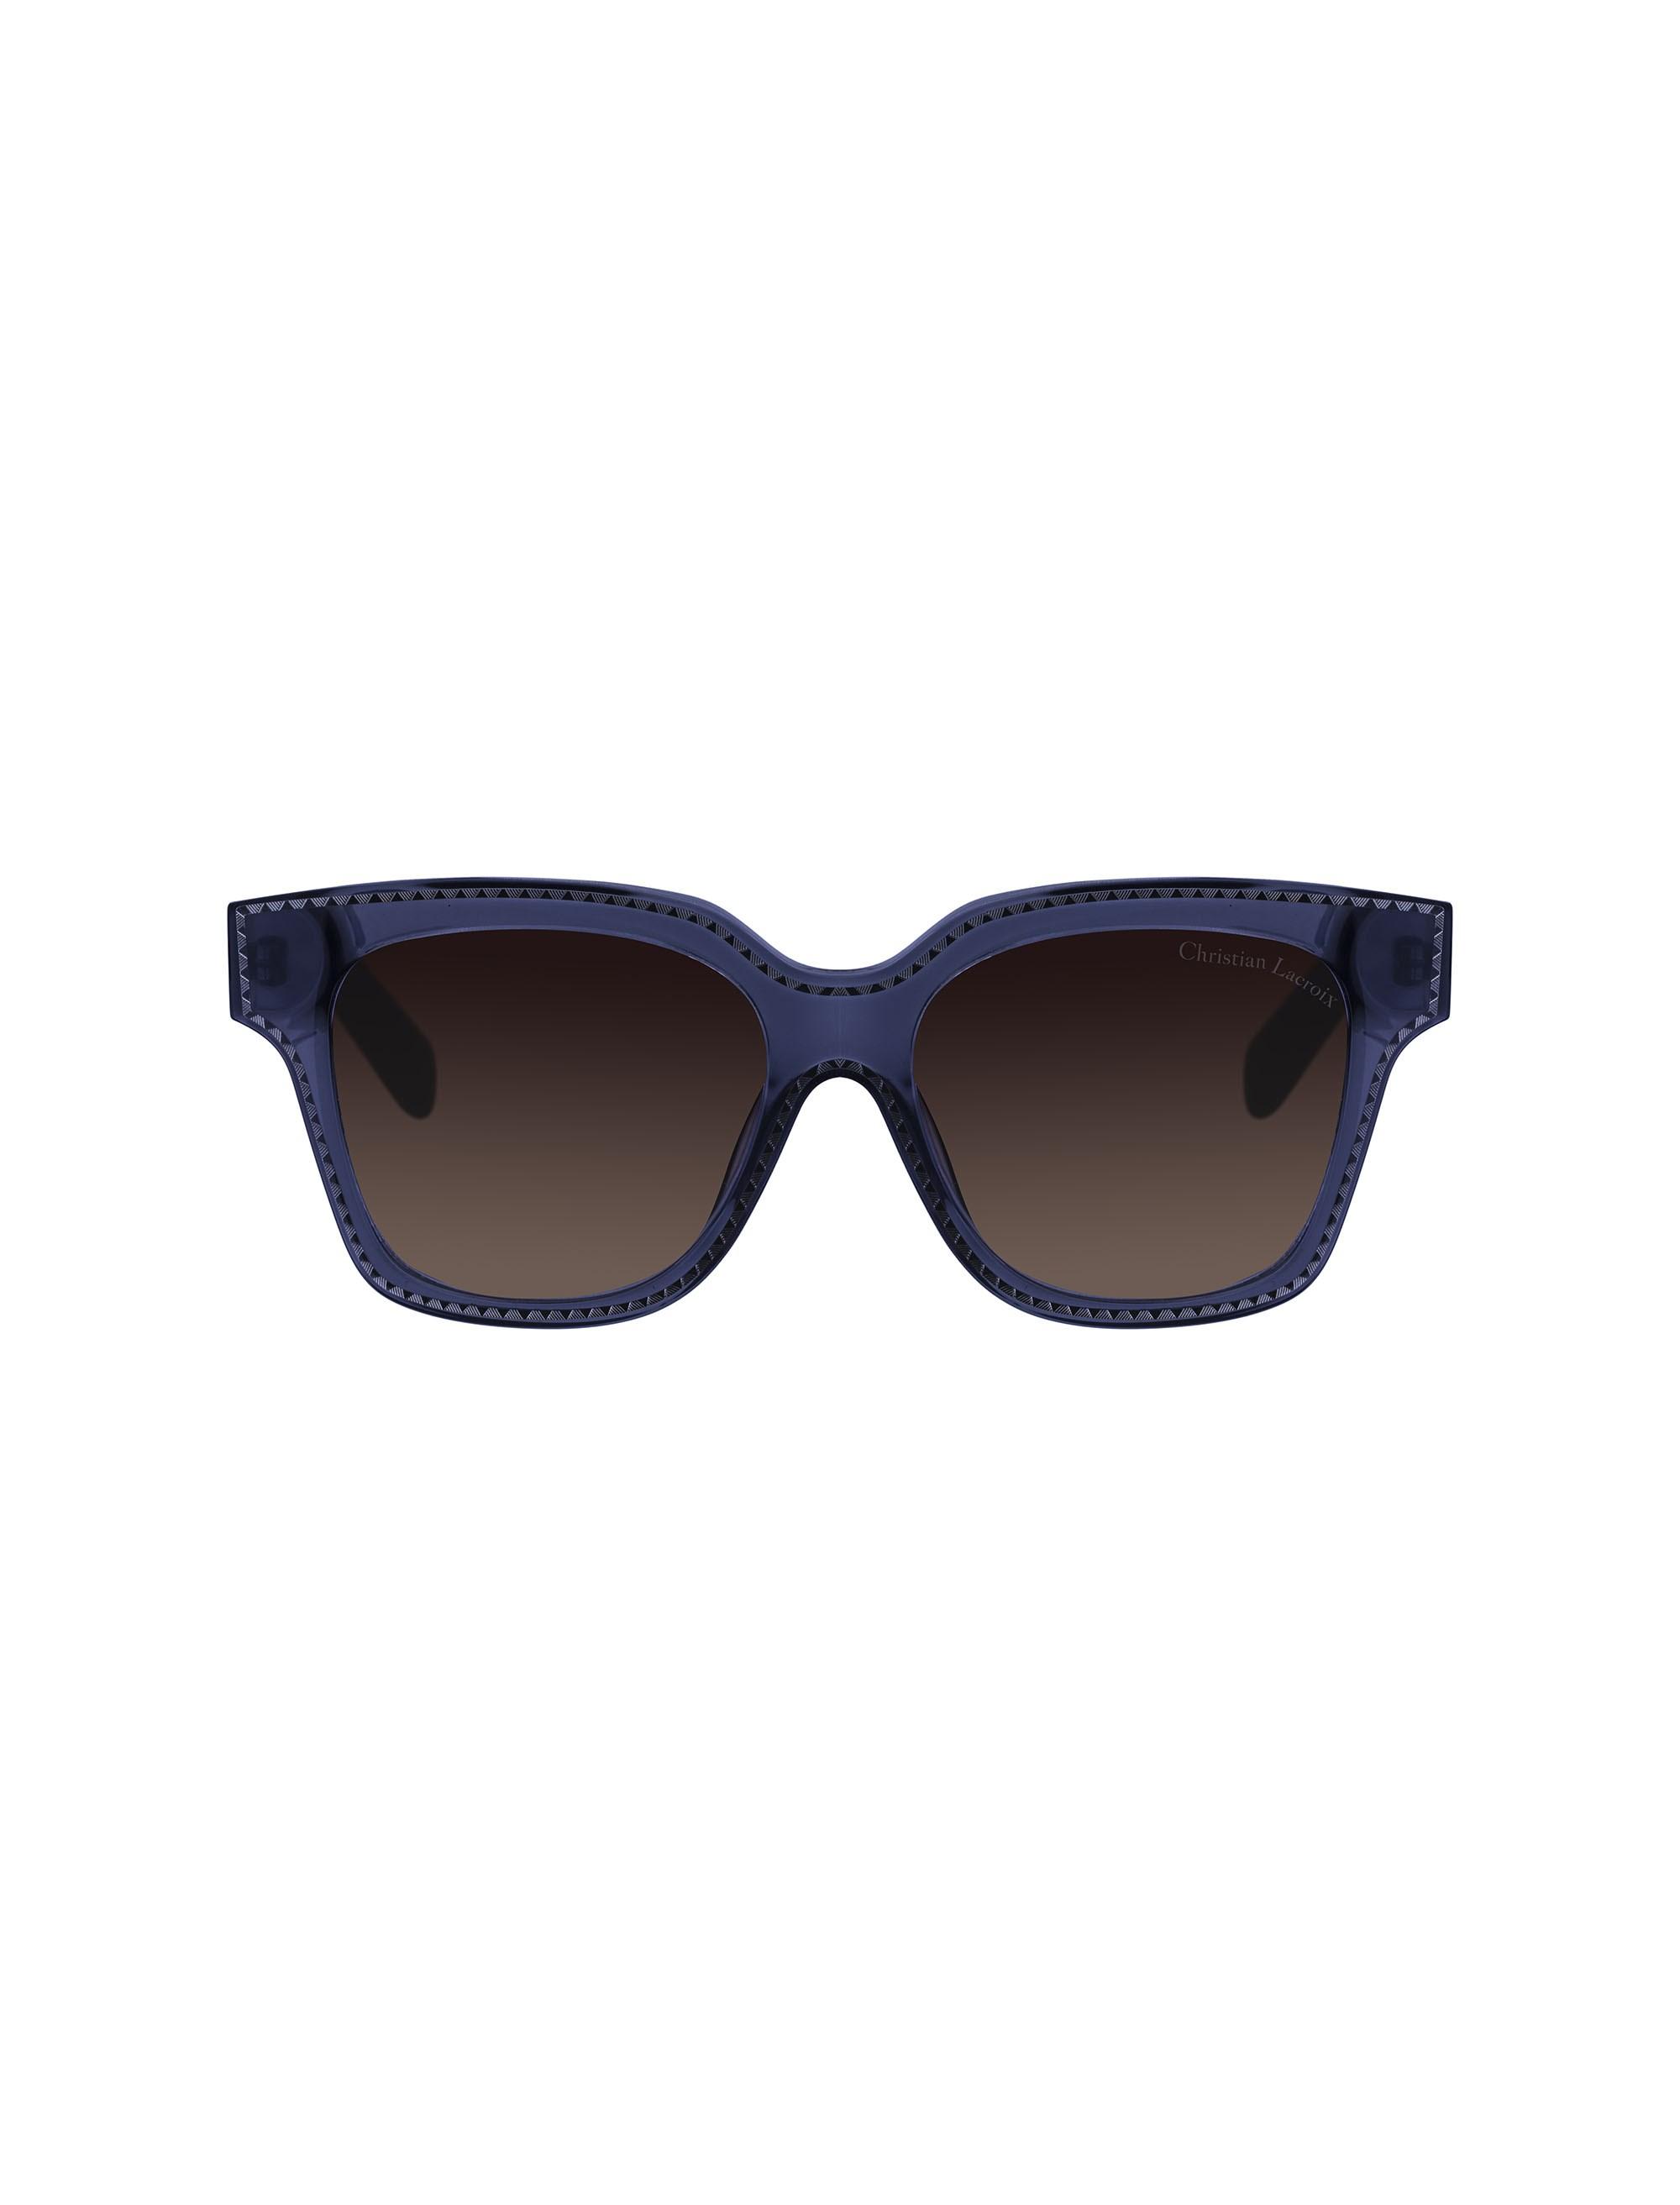 قیمت عینک آفتابی ویفرر زنانه - کریستین لاکروآ